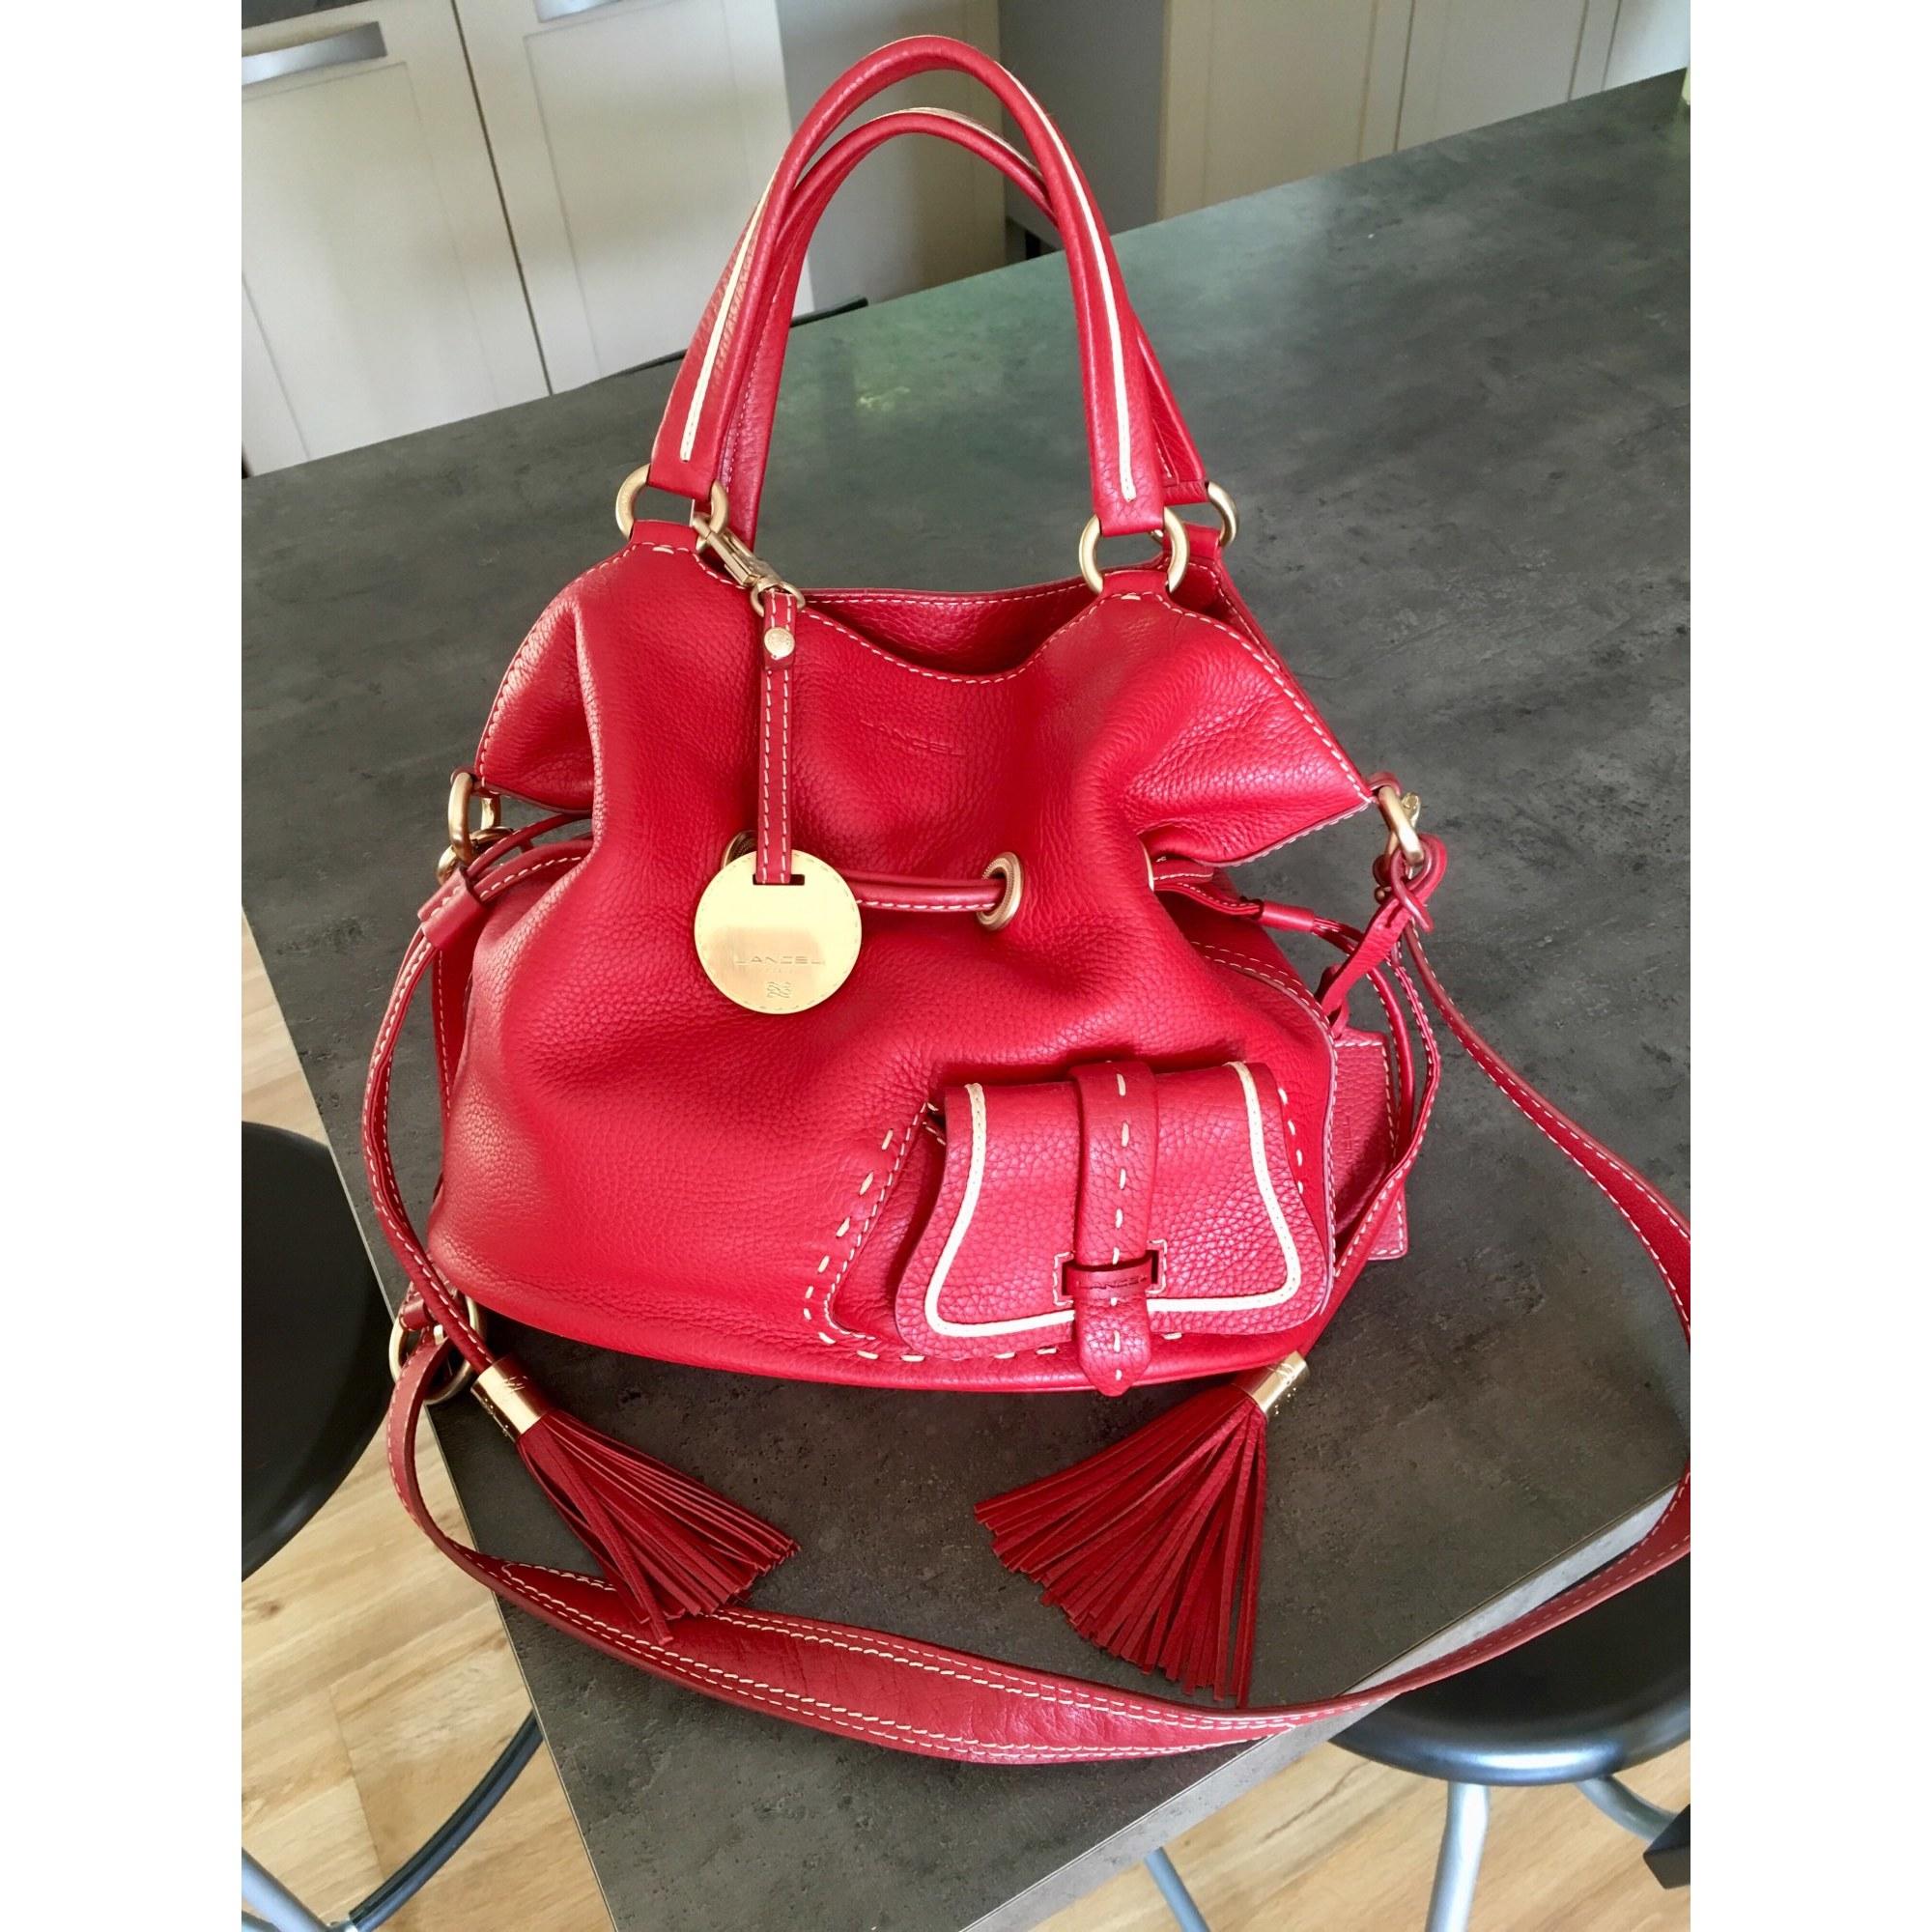 Lancel in venduta Xl pelle da Stardust07 Borsa 7867571 rossa dFwf5Adq